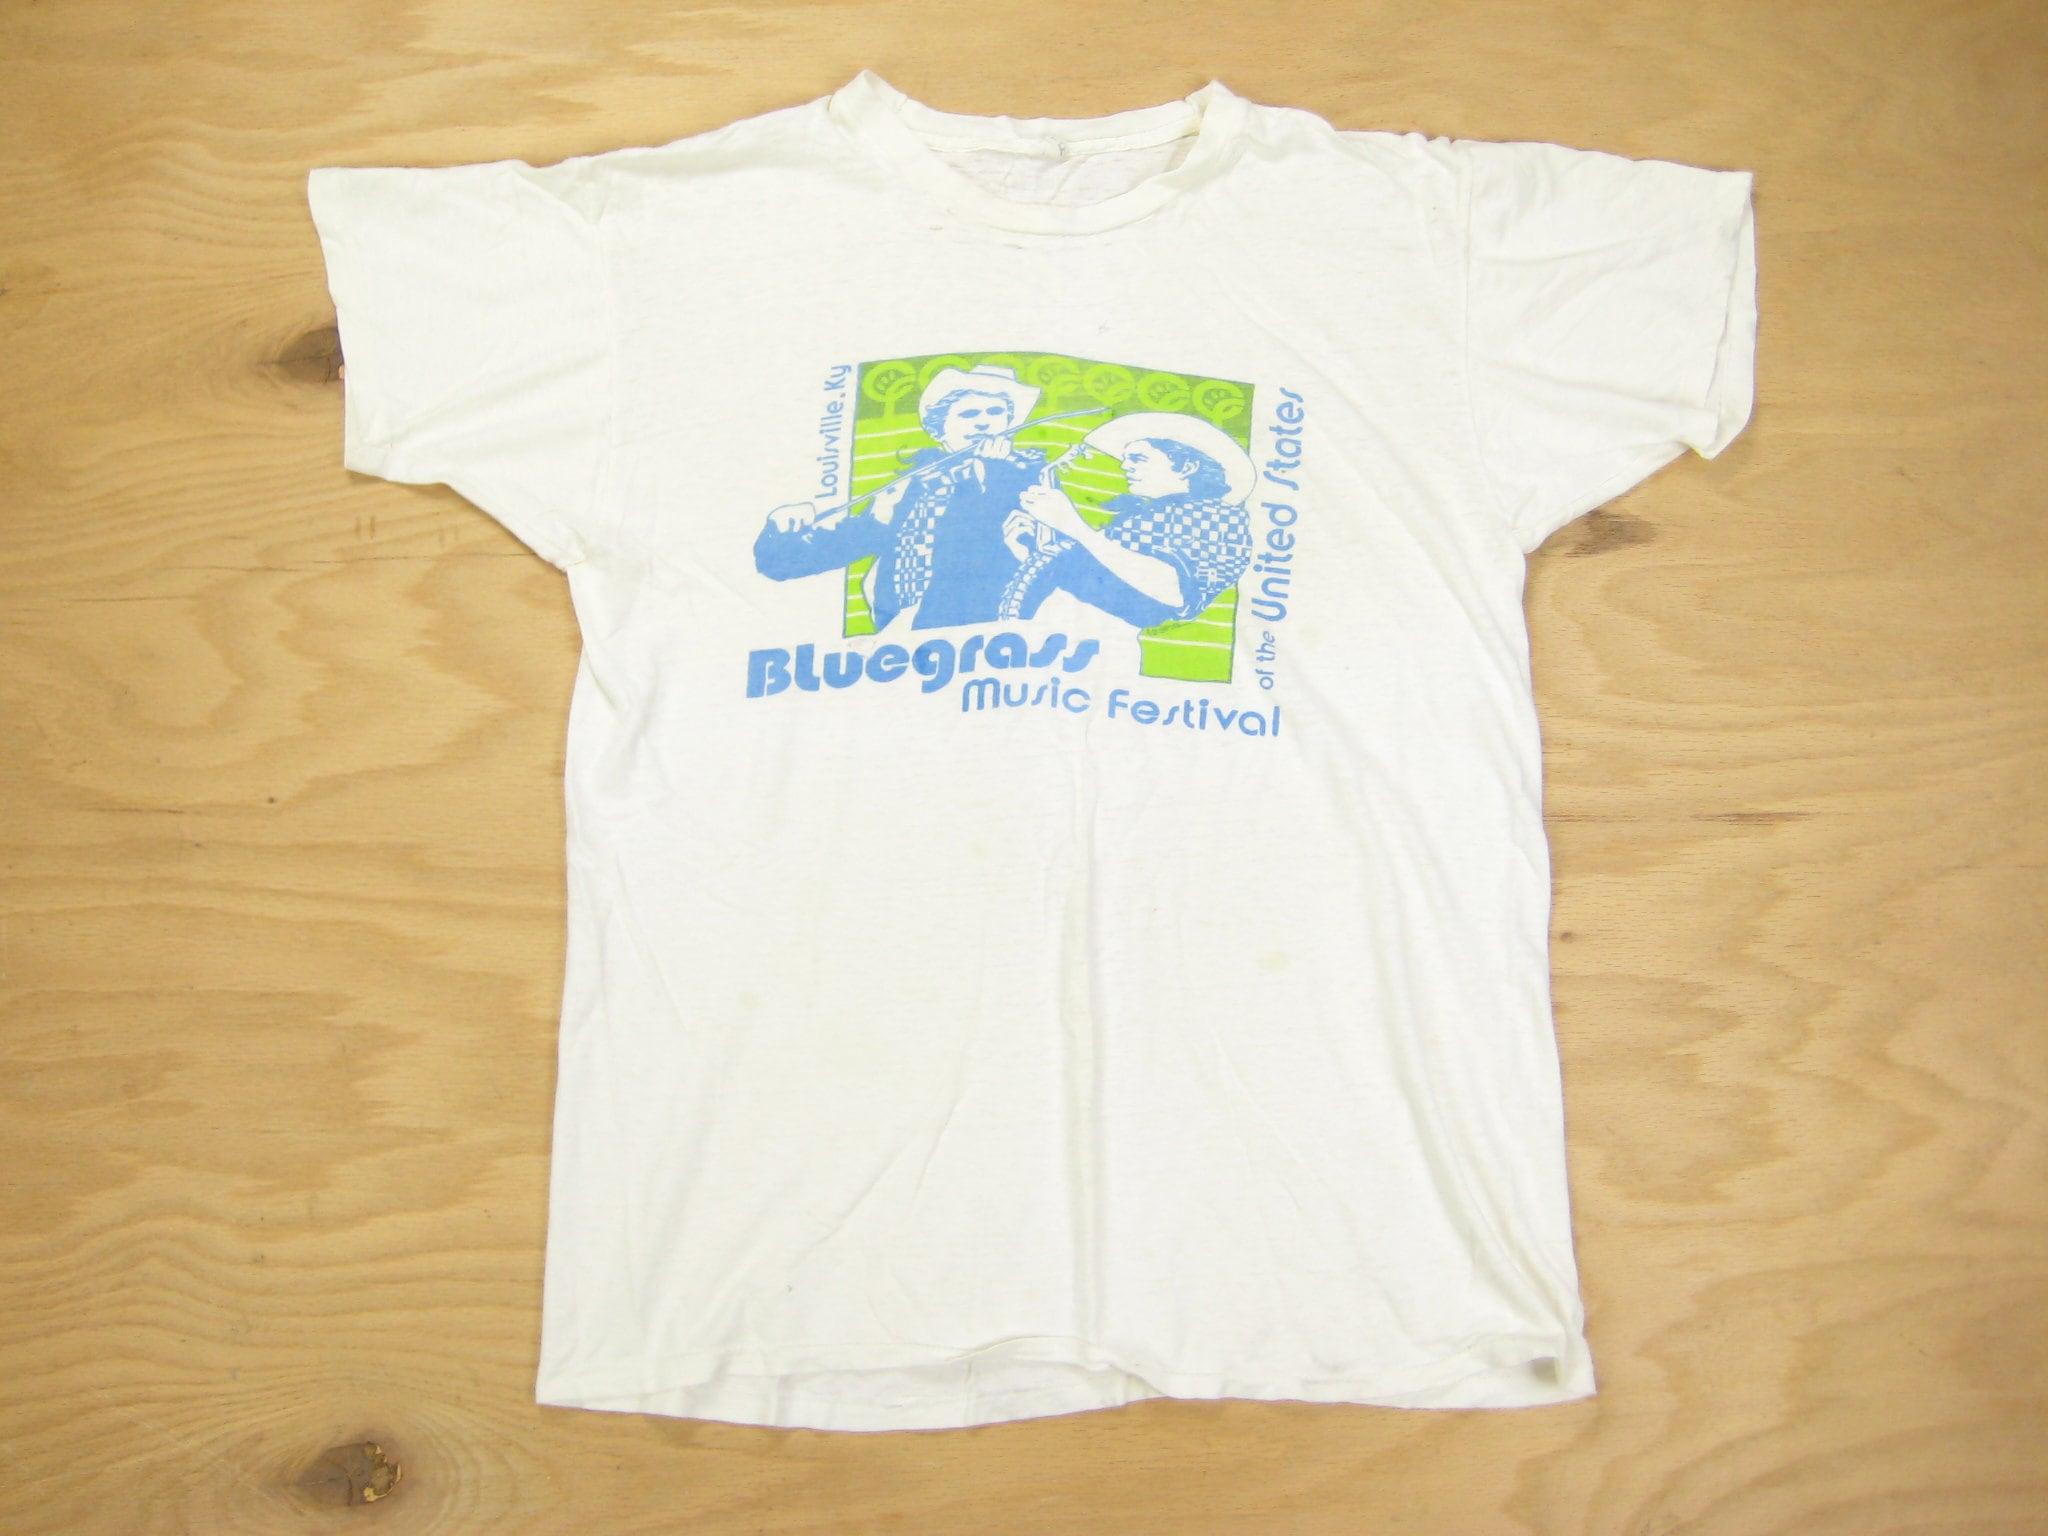 1970s Men's Shirt Styles – Vintage 70s Shirts for Guys 1970S Blue Grass Festival Tee Vintage Retro White 100 Cotton Derby Louisville Kentucky Music Distressed Graphic T Shirt MMedium $75.00 AT vintagedancer.com